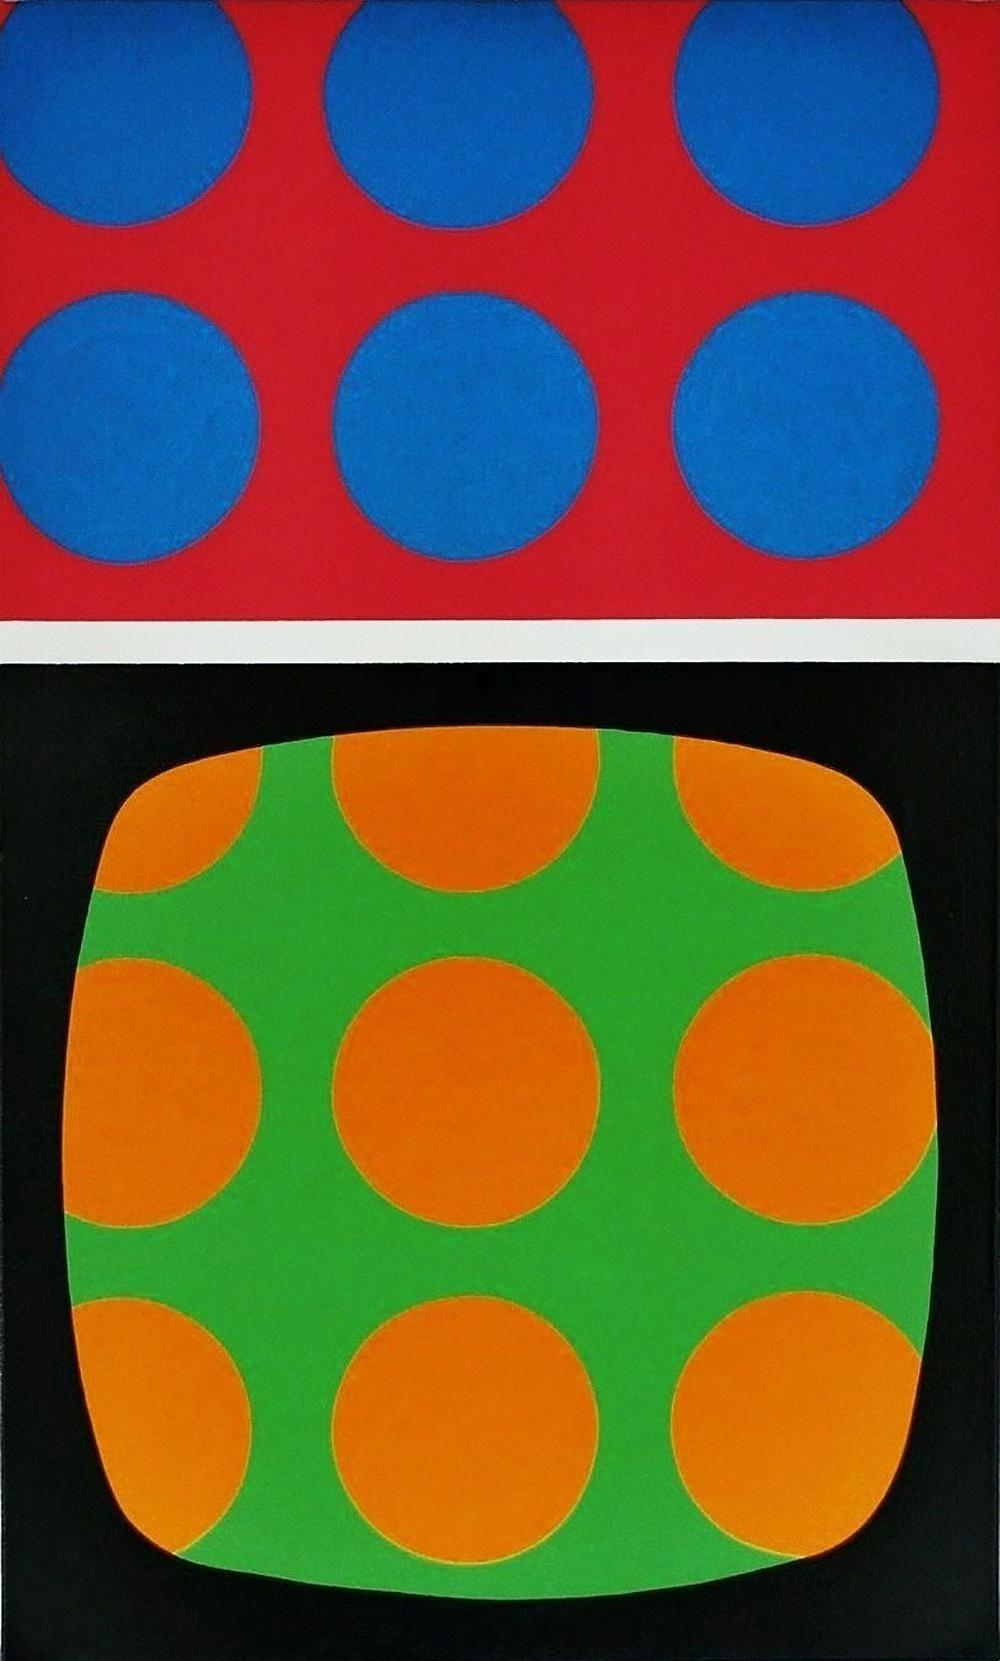 o.T. | Acryl auf Leinwand | 1987 | 100 x 60 cm